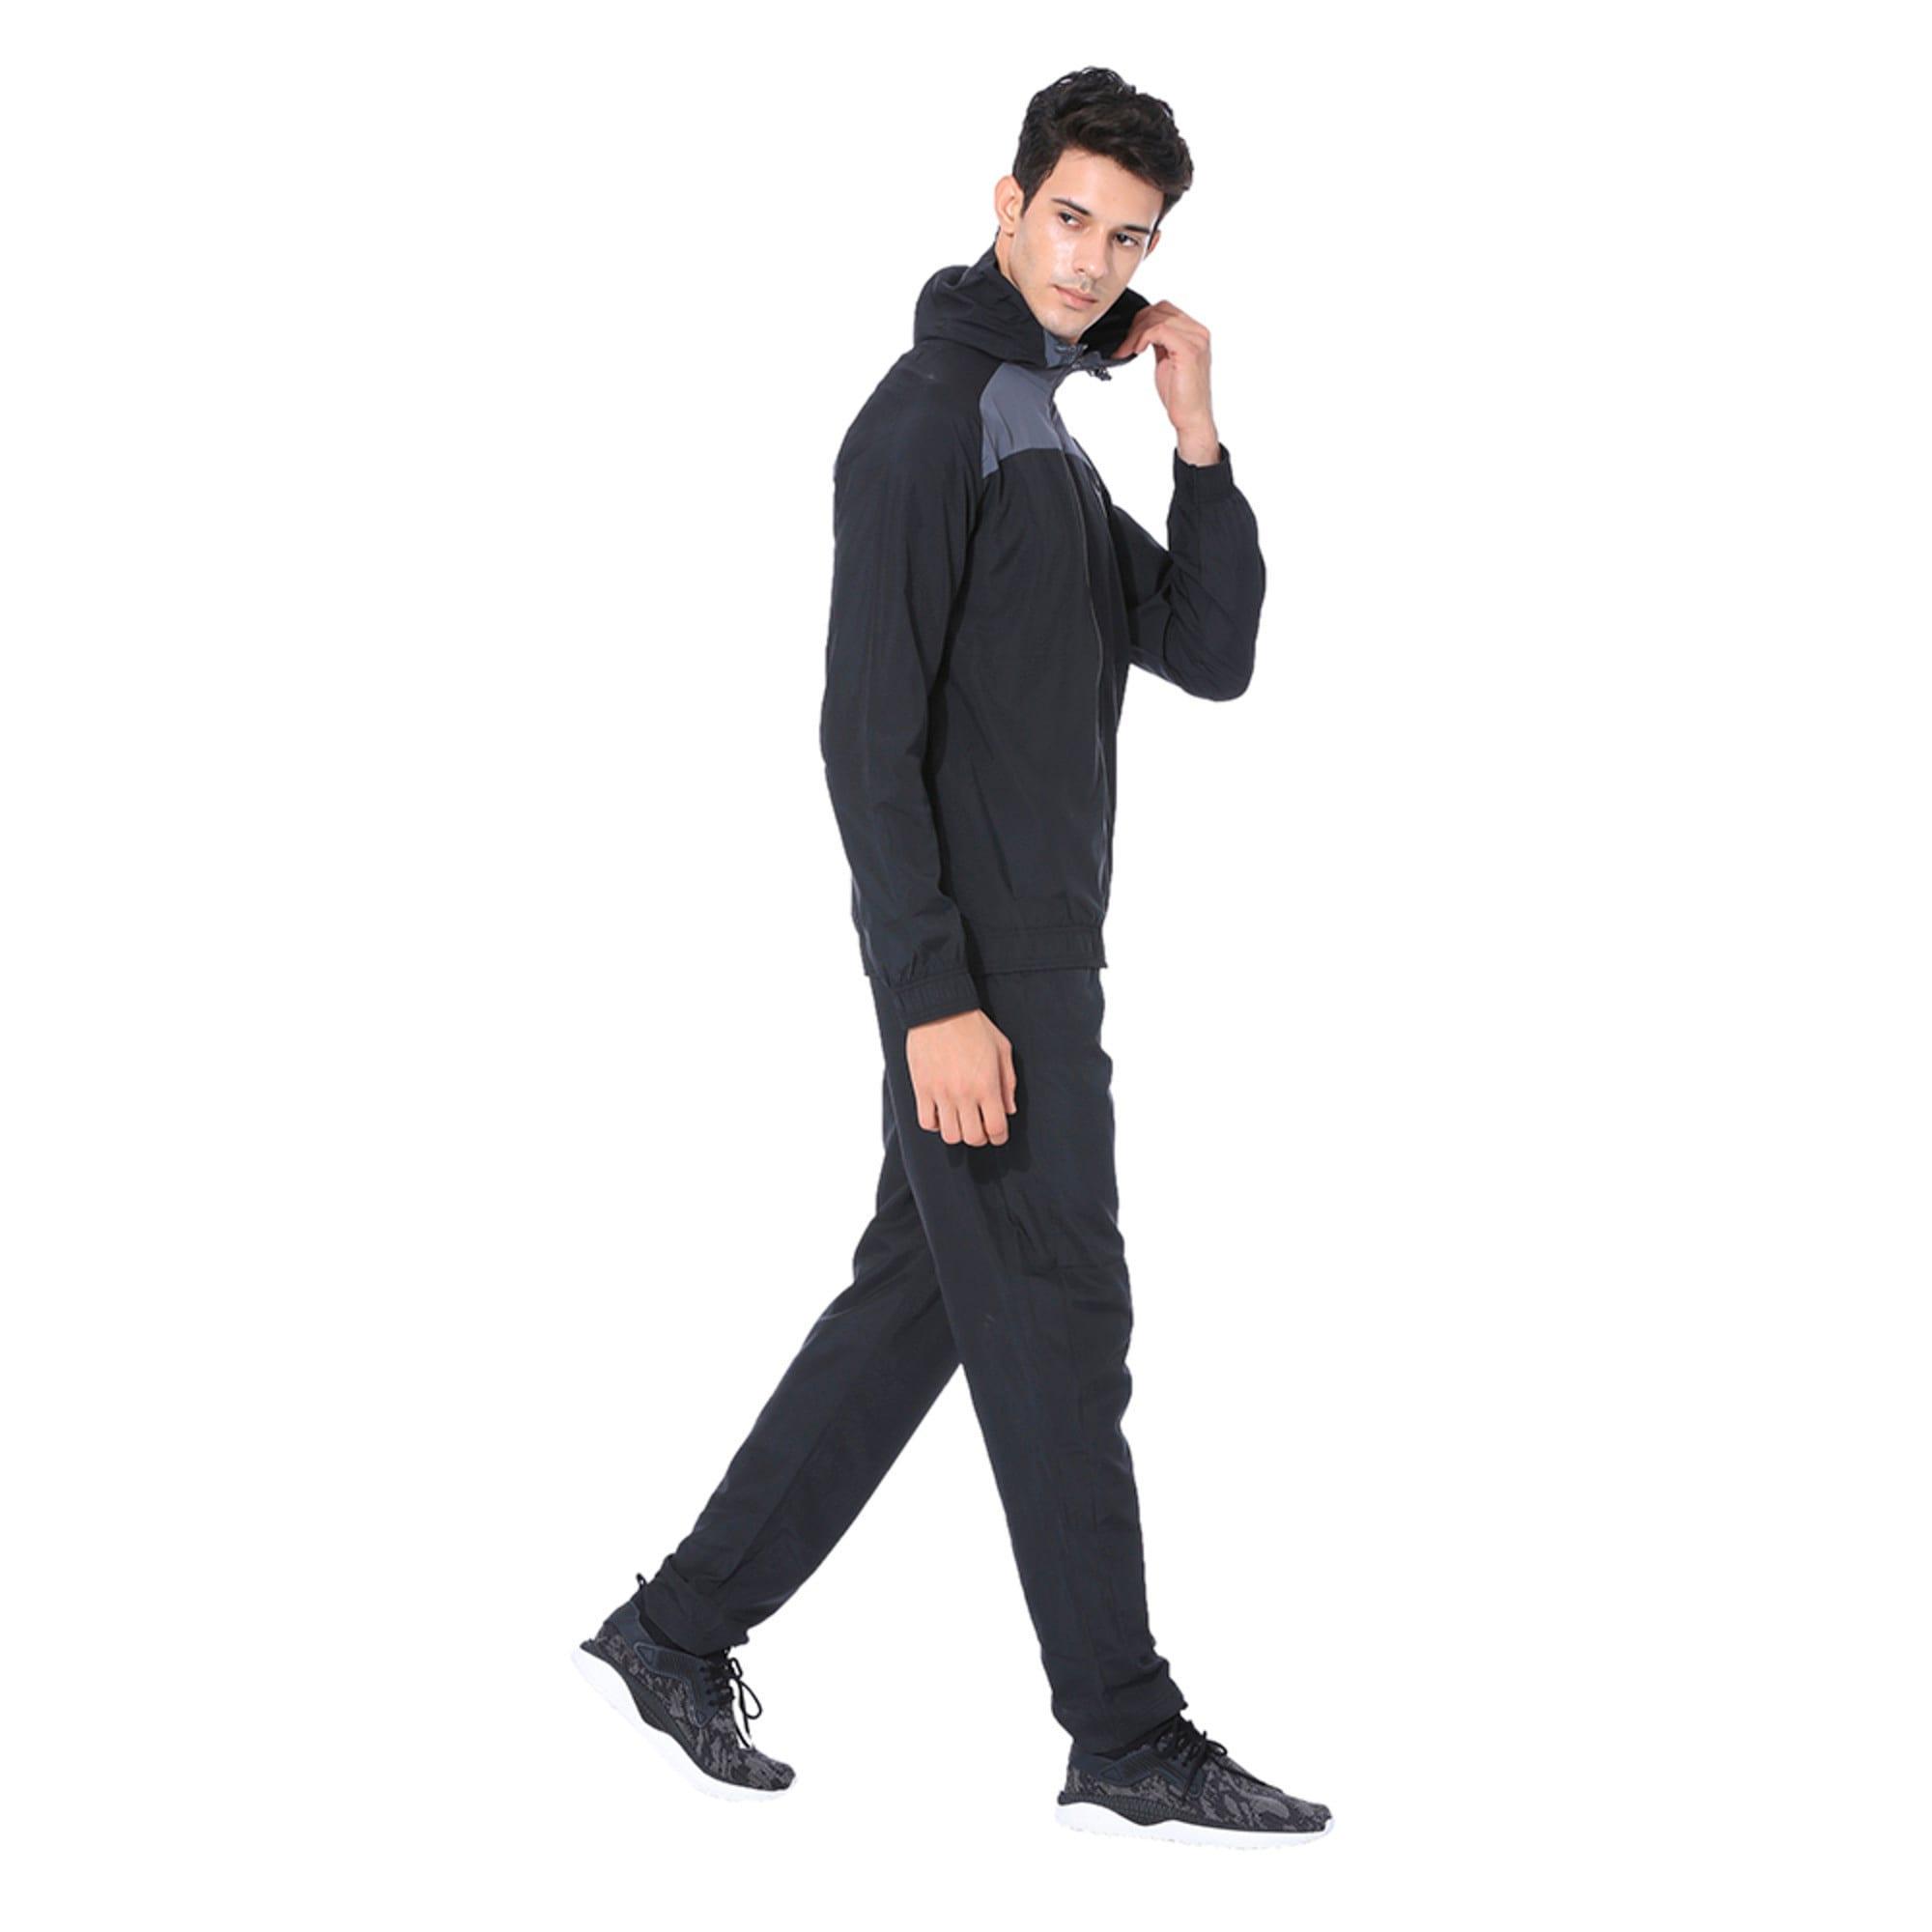 Thumbnail 2 of Modern Sport Hooded Suit Op. Peacoat-Pum, Puma Black-Iron Gate, medium-IND